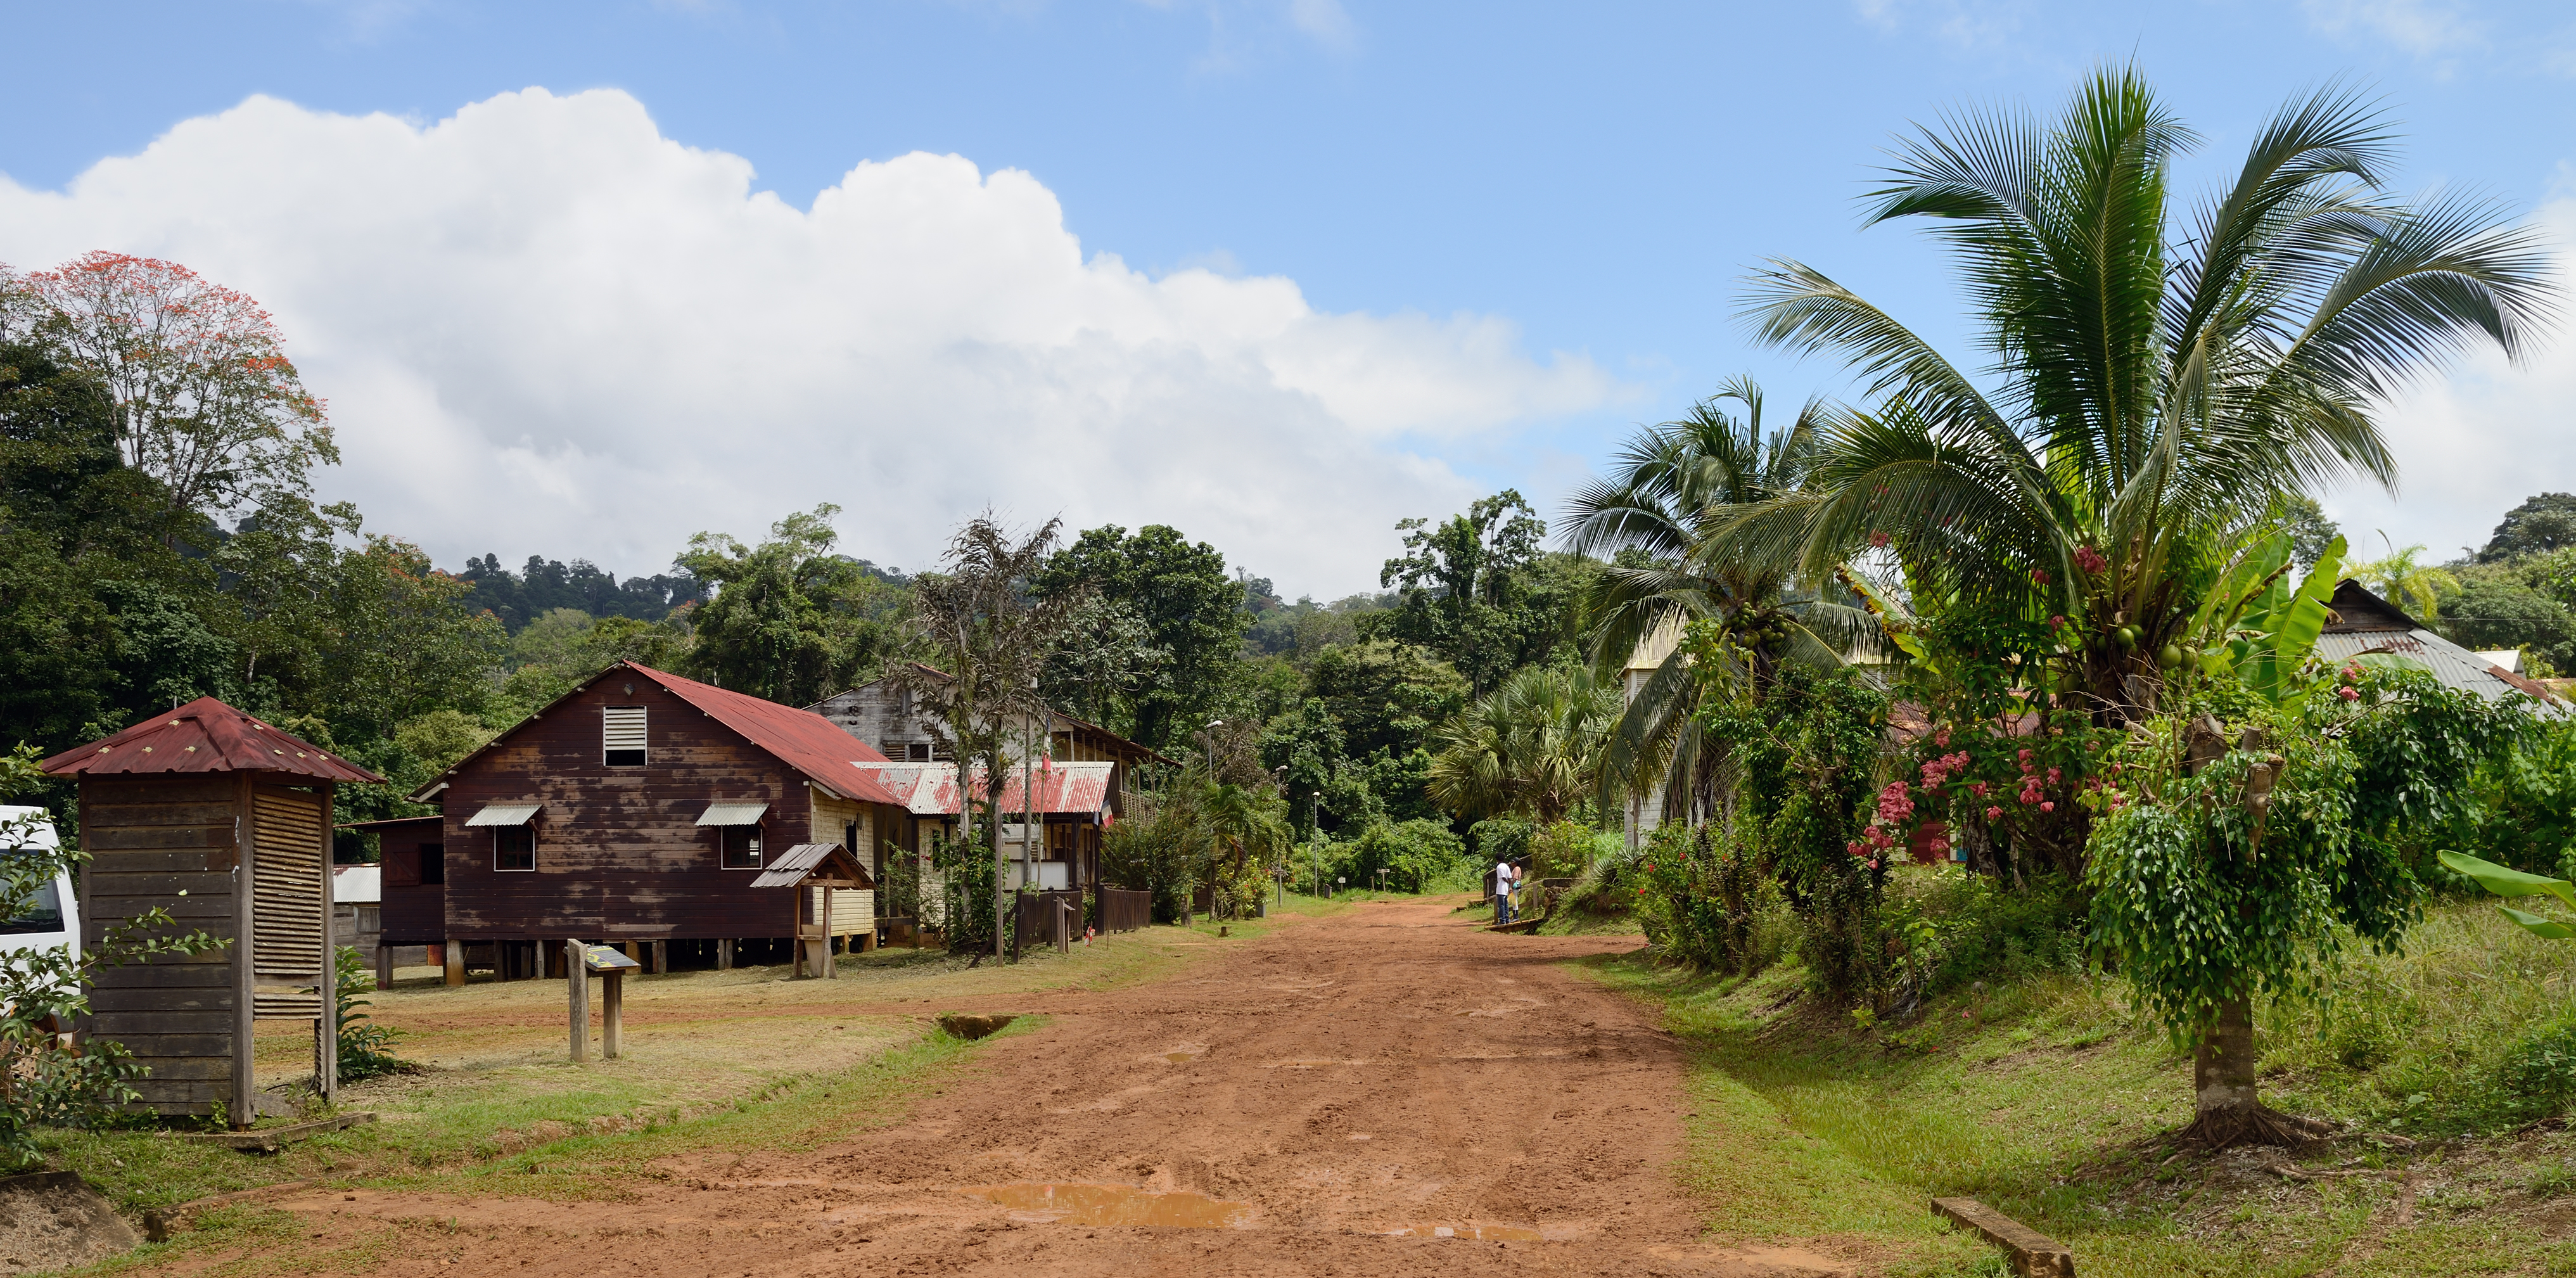 Maravilhas Guiana Francesa